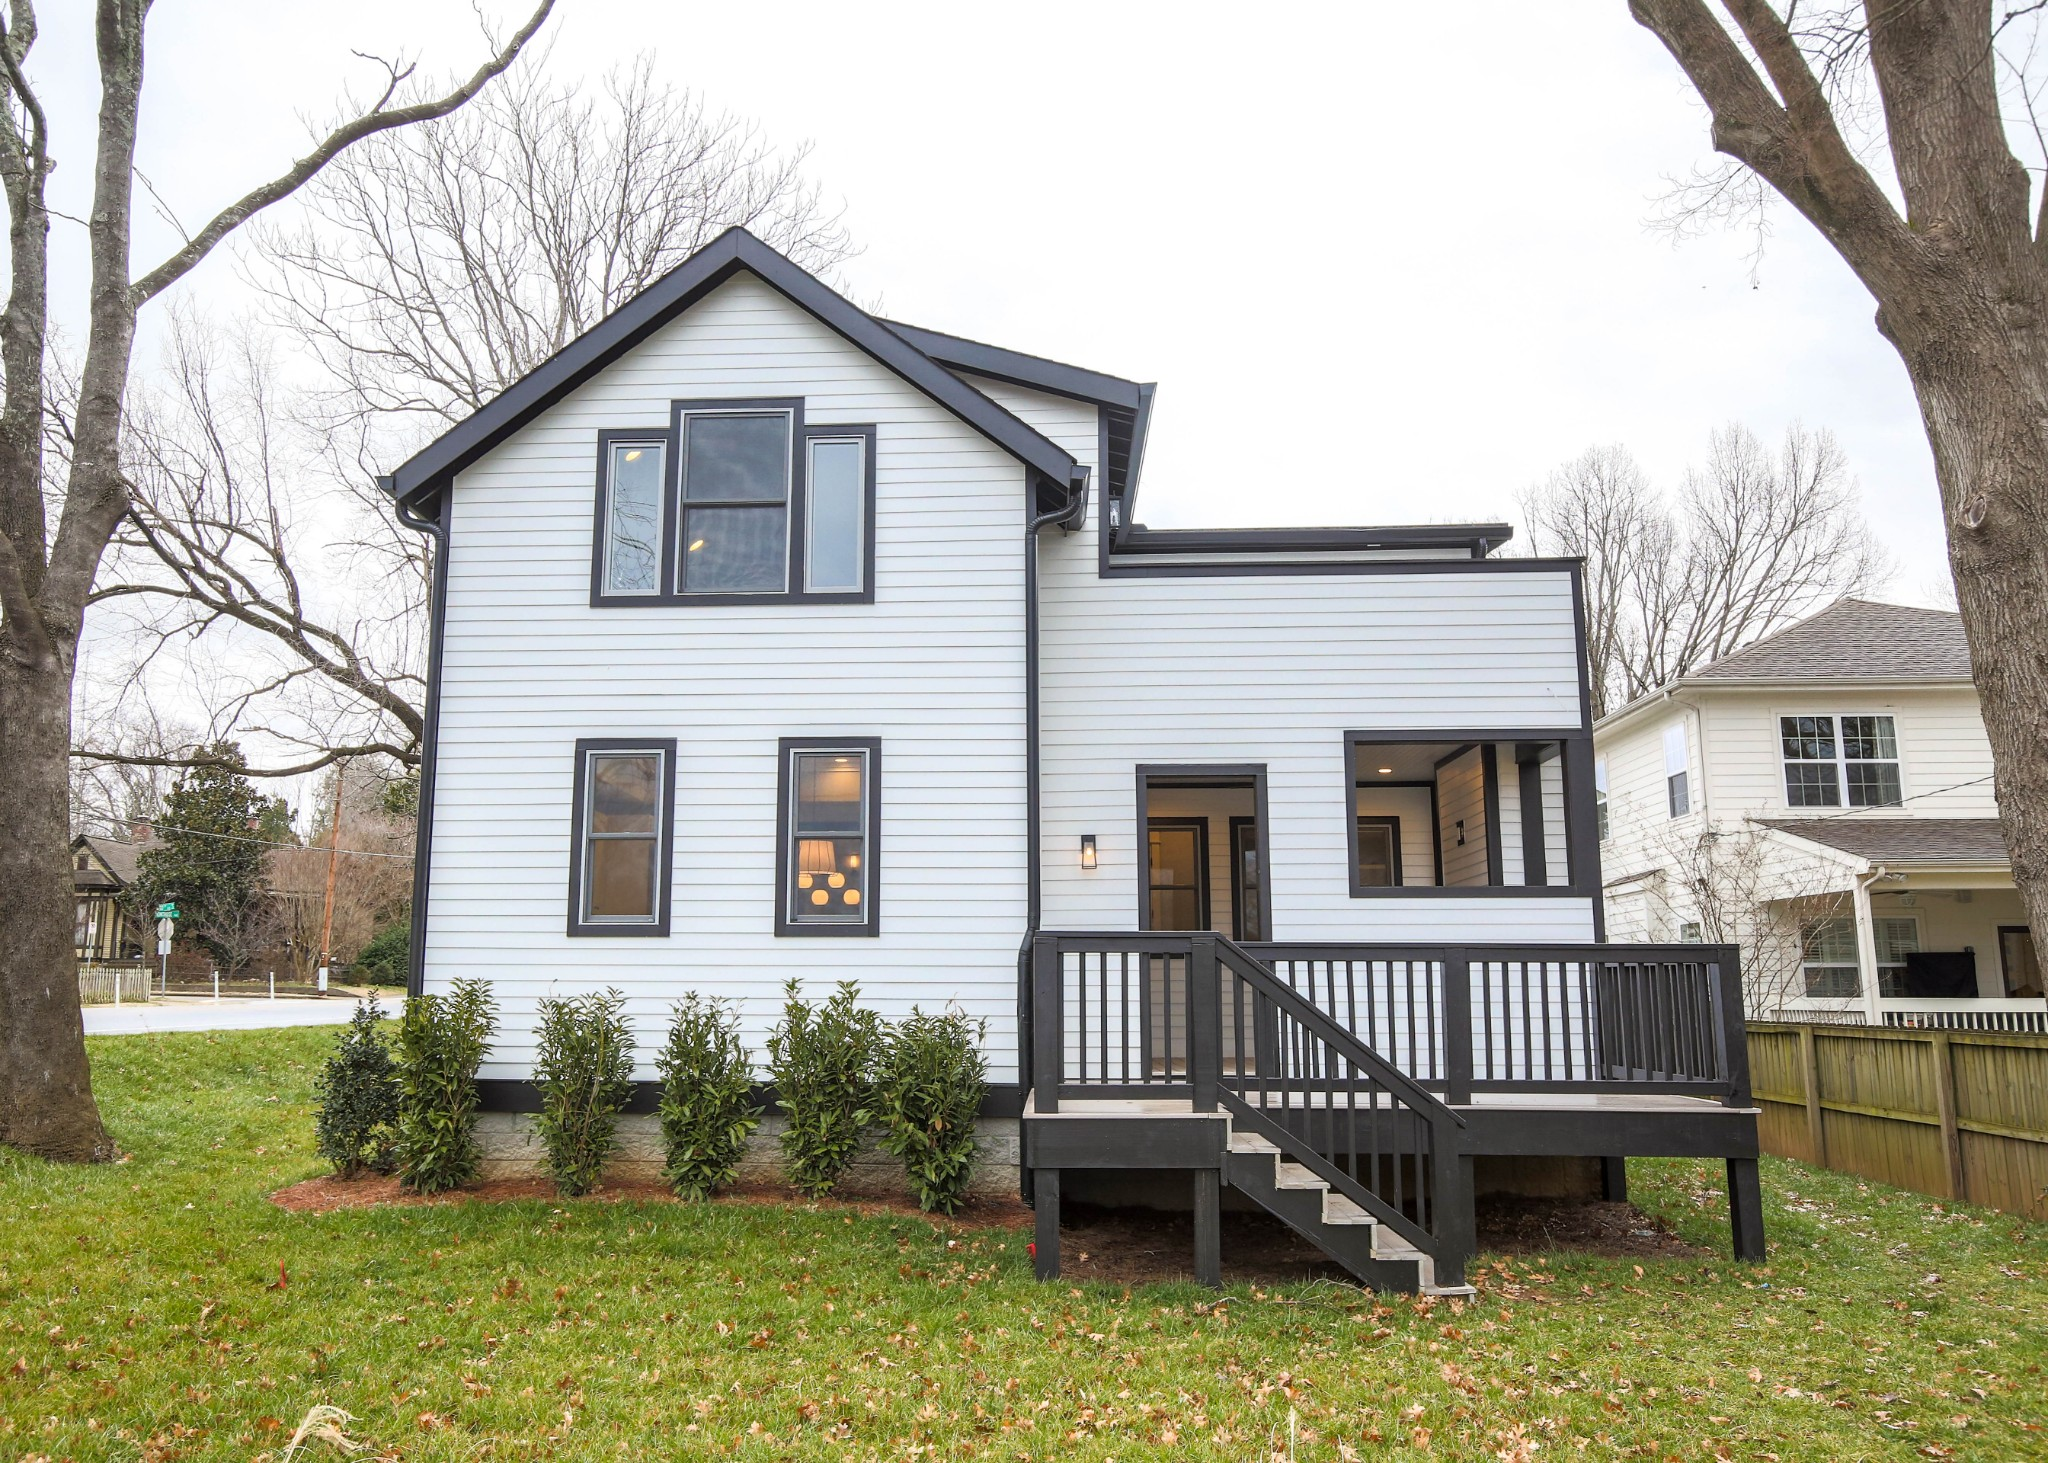 2602 10th Ave S Property Photo - Nashville, TN real estate listing